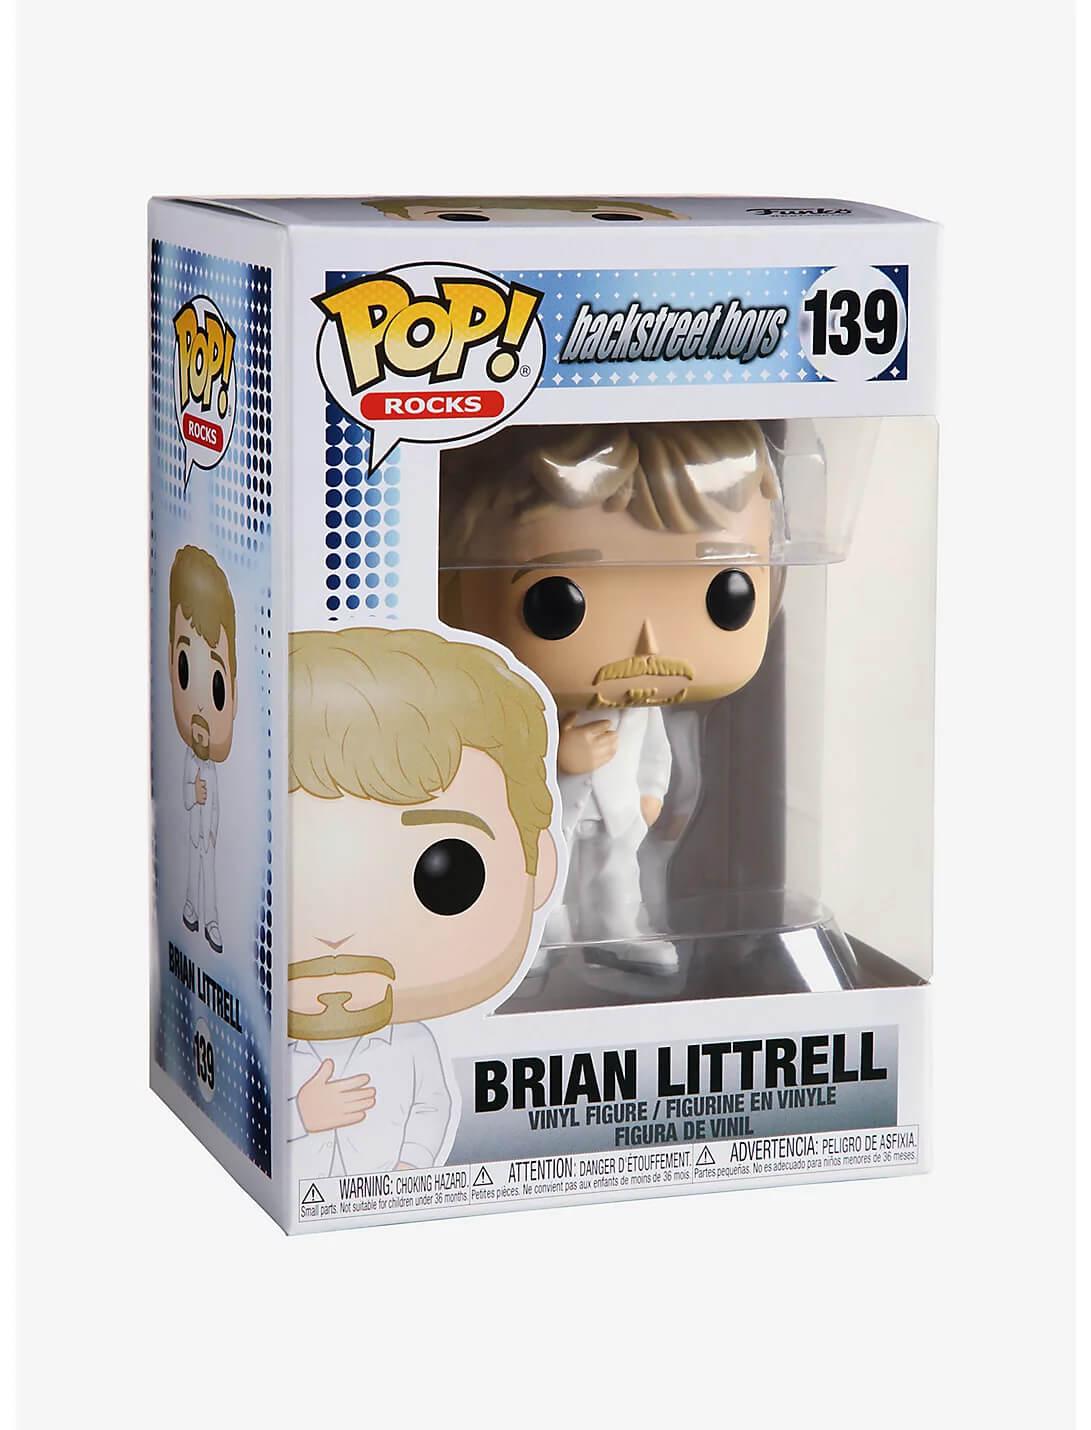 Brian Littrell #139 - Backstreet Boys - Funko Pop! Rocks